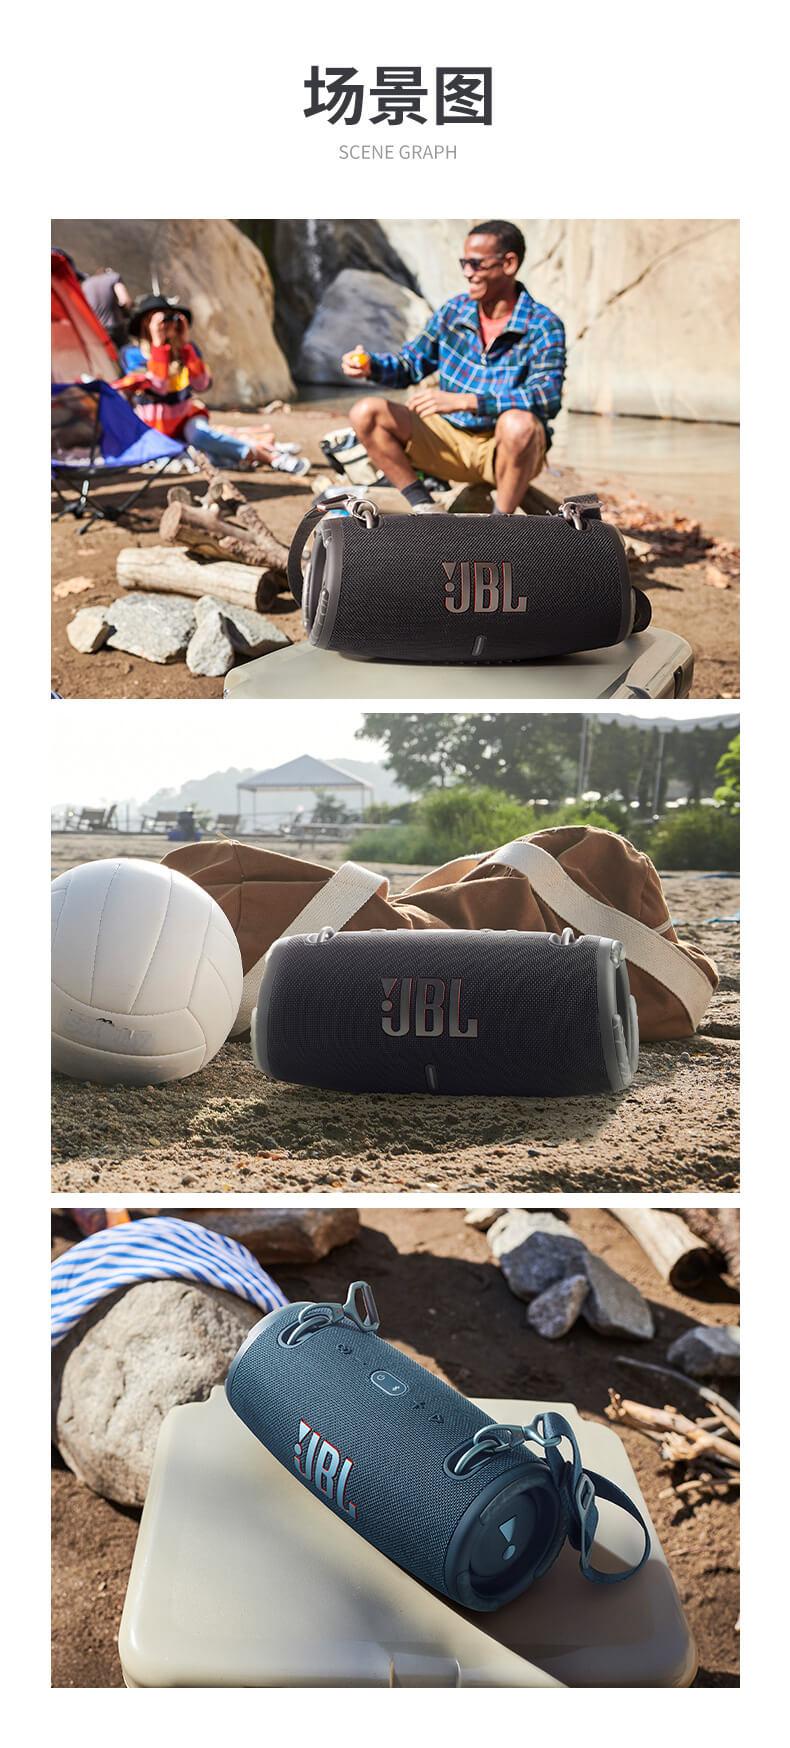 JBL XTREME3音乐战鼓3代无线蓝牙音箱便携迷你户外小音响hifi低音